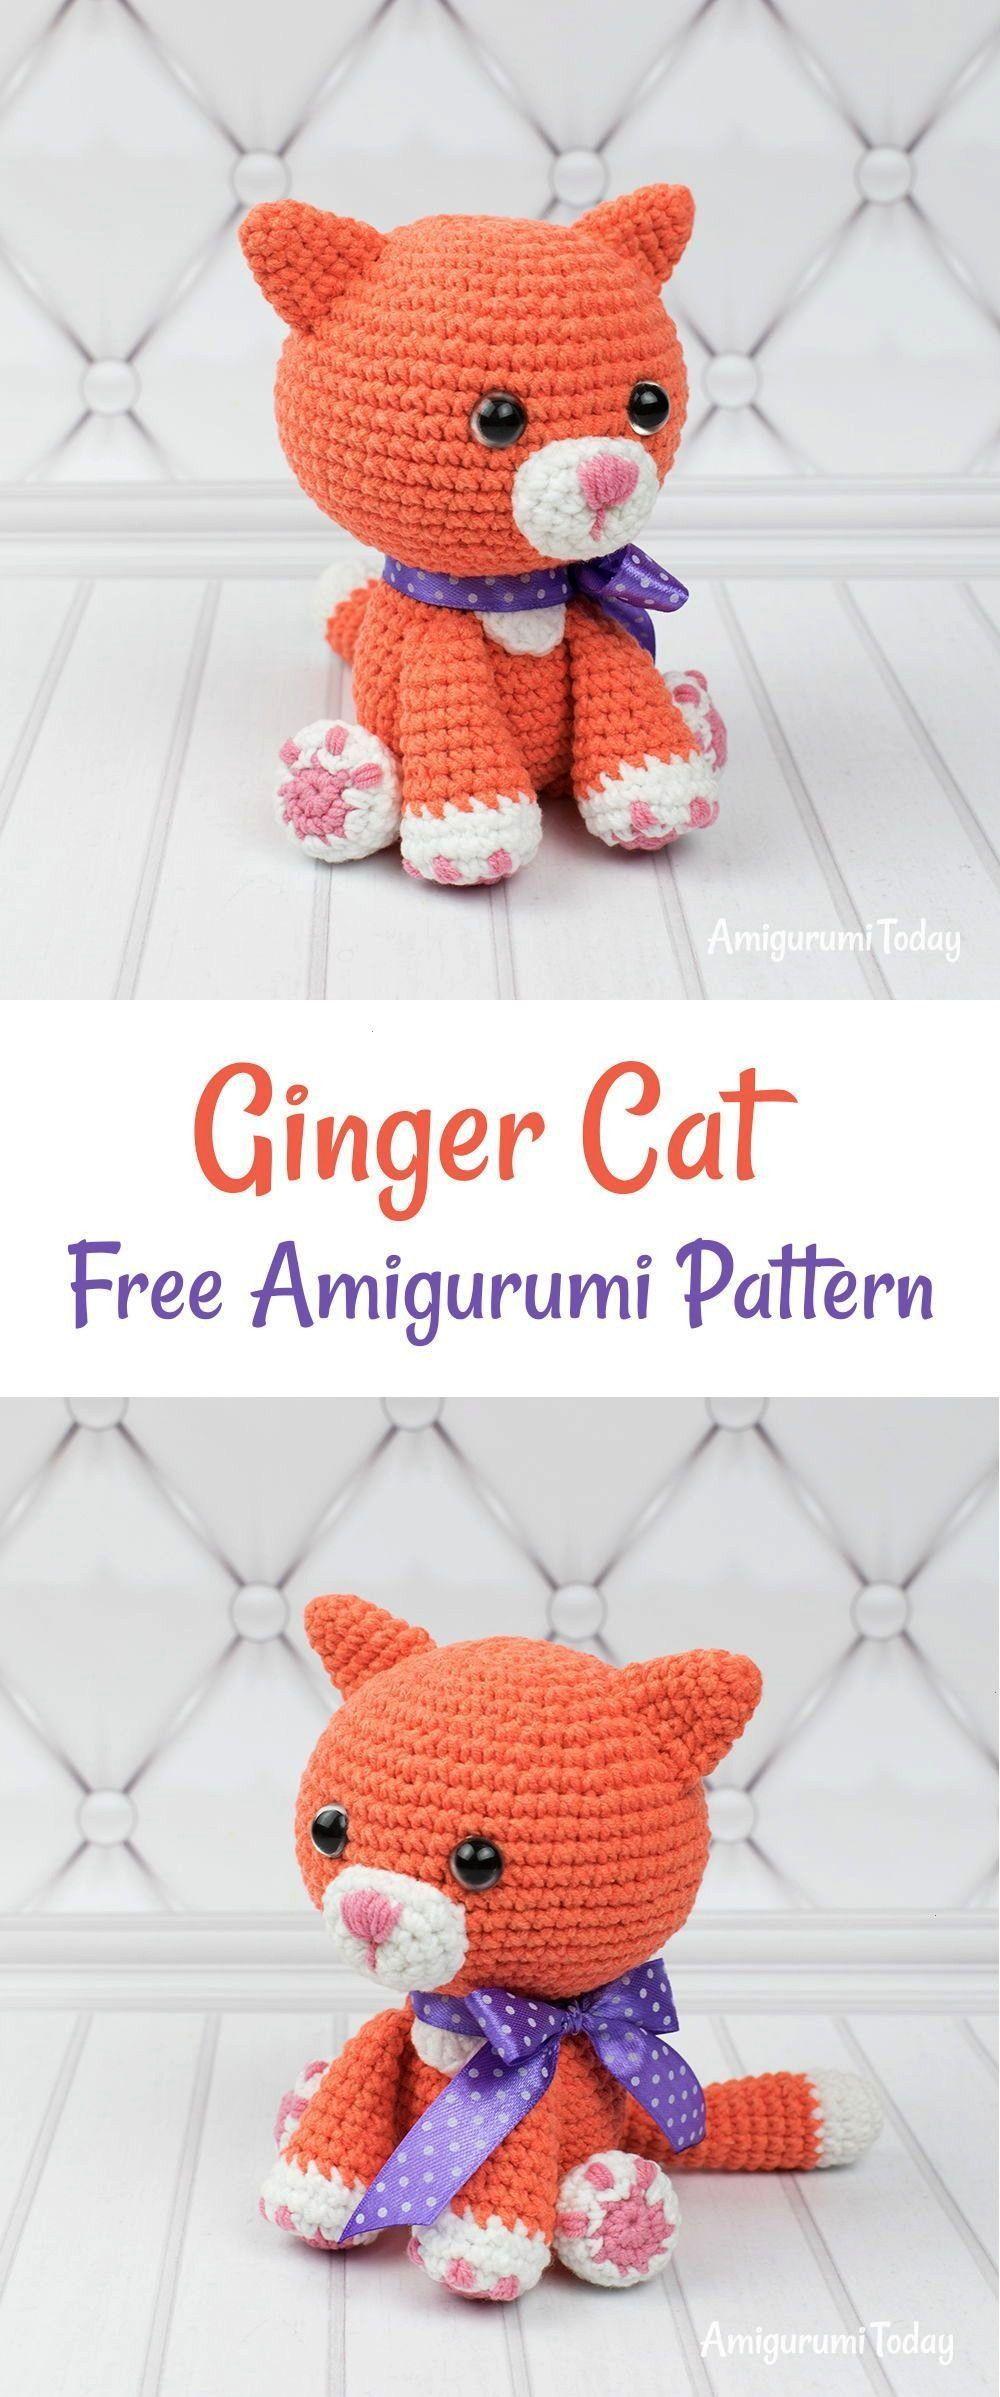 Amigurumipattern Amigurumi Pattern Ginger Today Cat Pginger